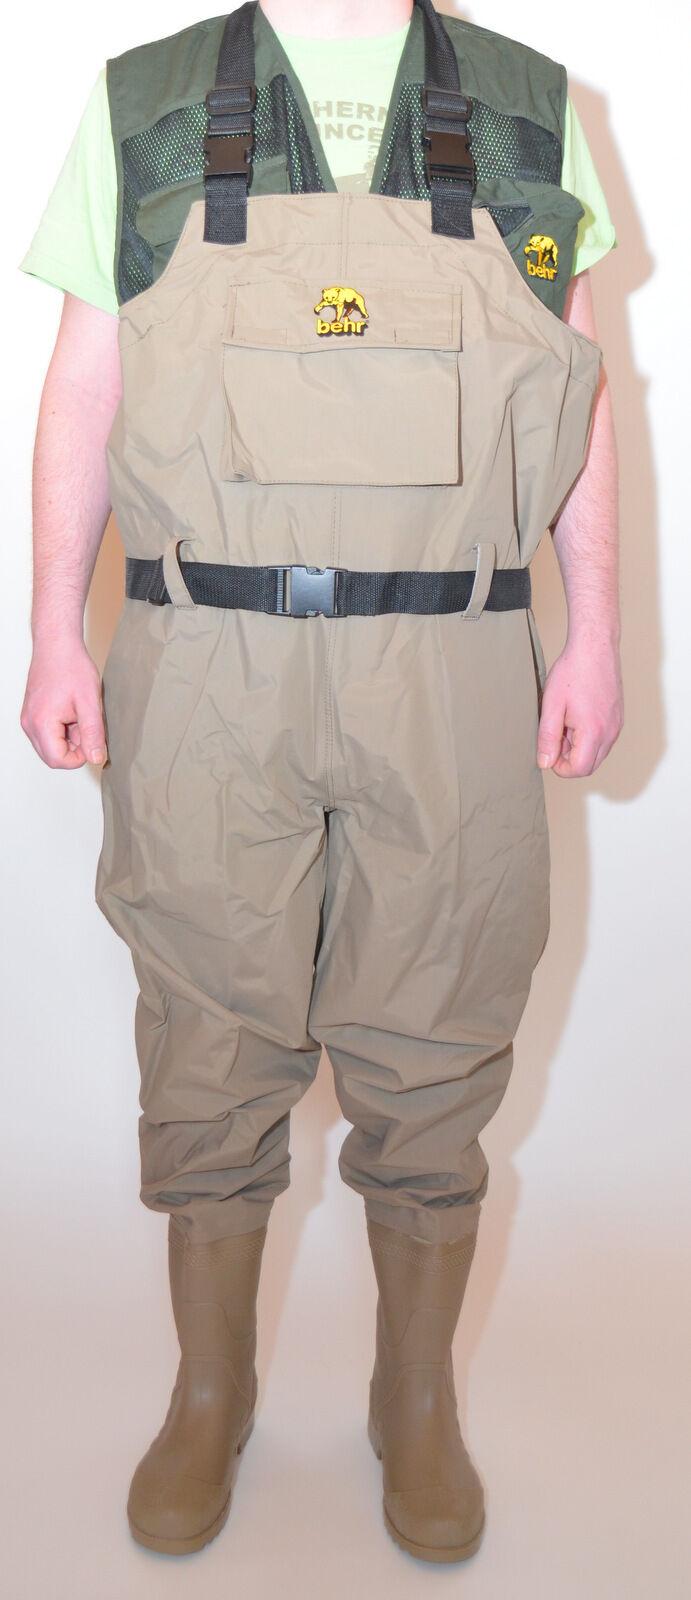 Behr Trendex EverDry Nylon PVC Wathose mit Stiefeln und Gummisohle Gummisohle Gummisohle in Gr. 39-48 cccf0d